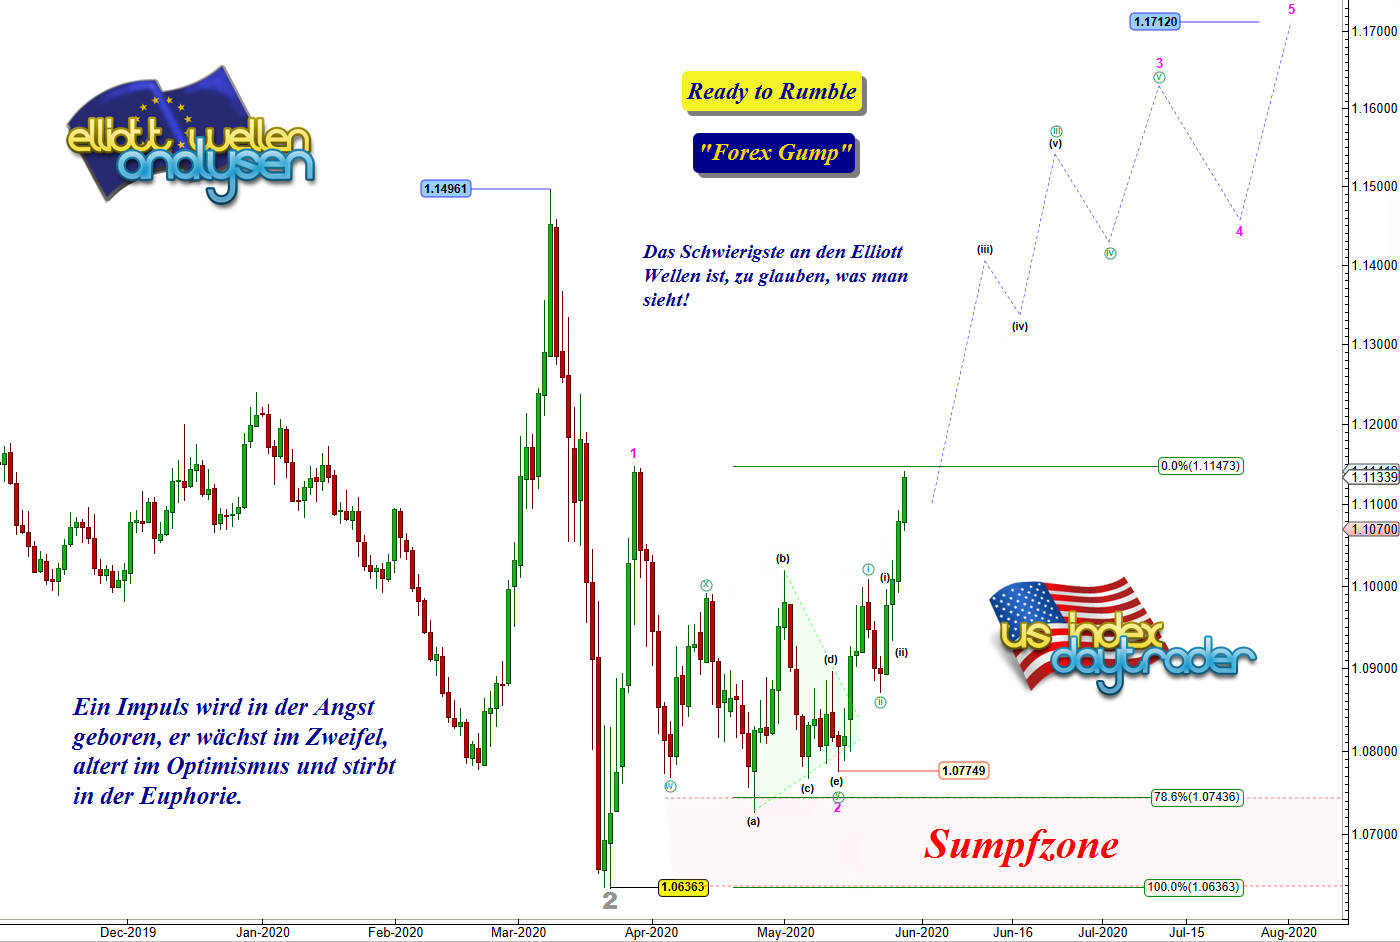 EW-Analyse-EUR-USD-Anlagenotstand-beflügelt-André-Tiedje-GodmodeTrader.de-1